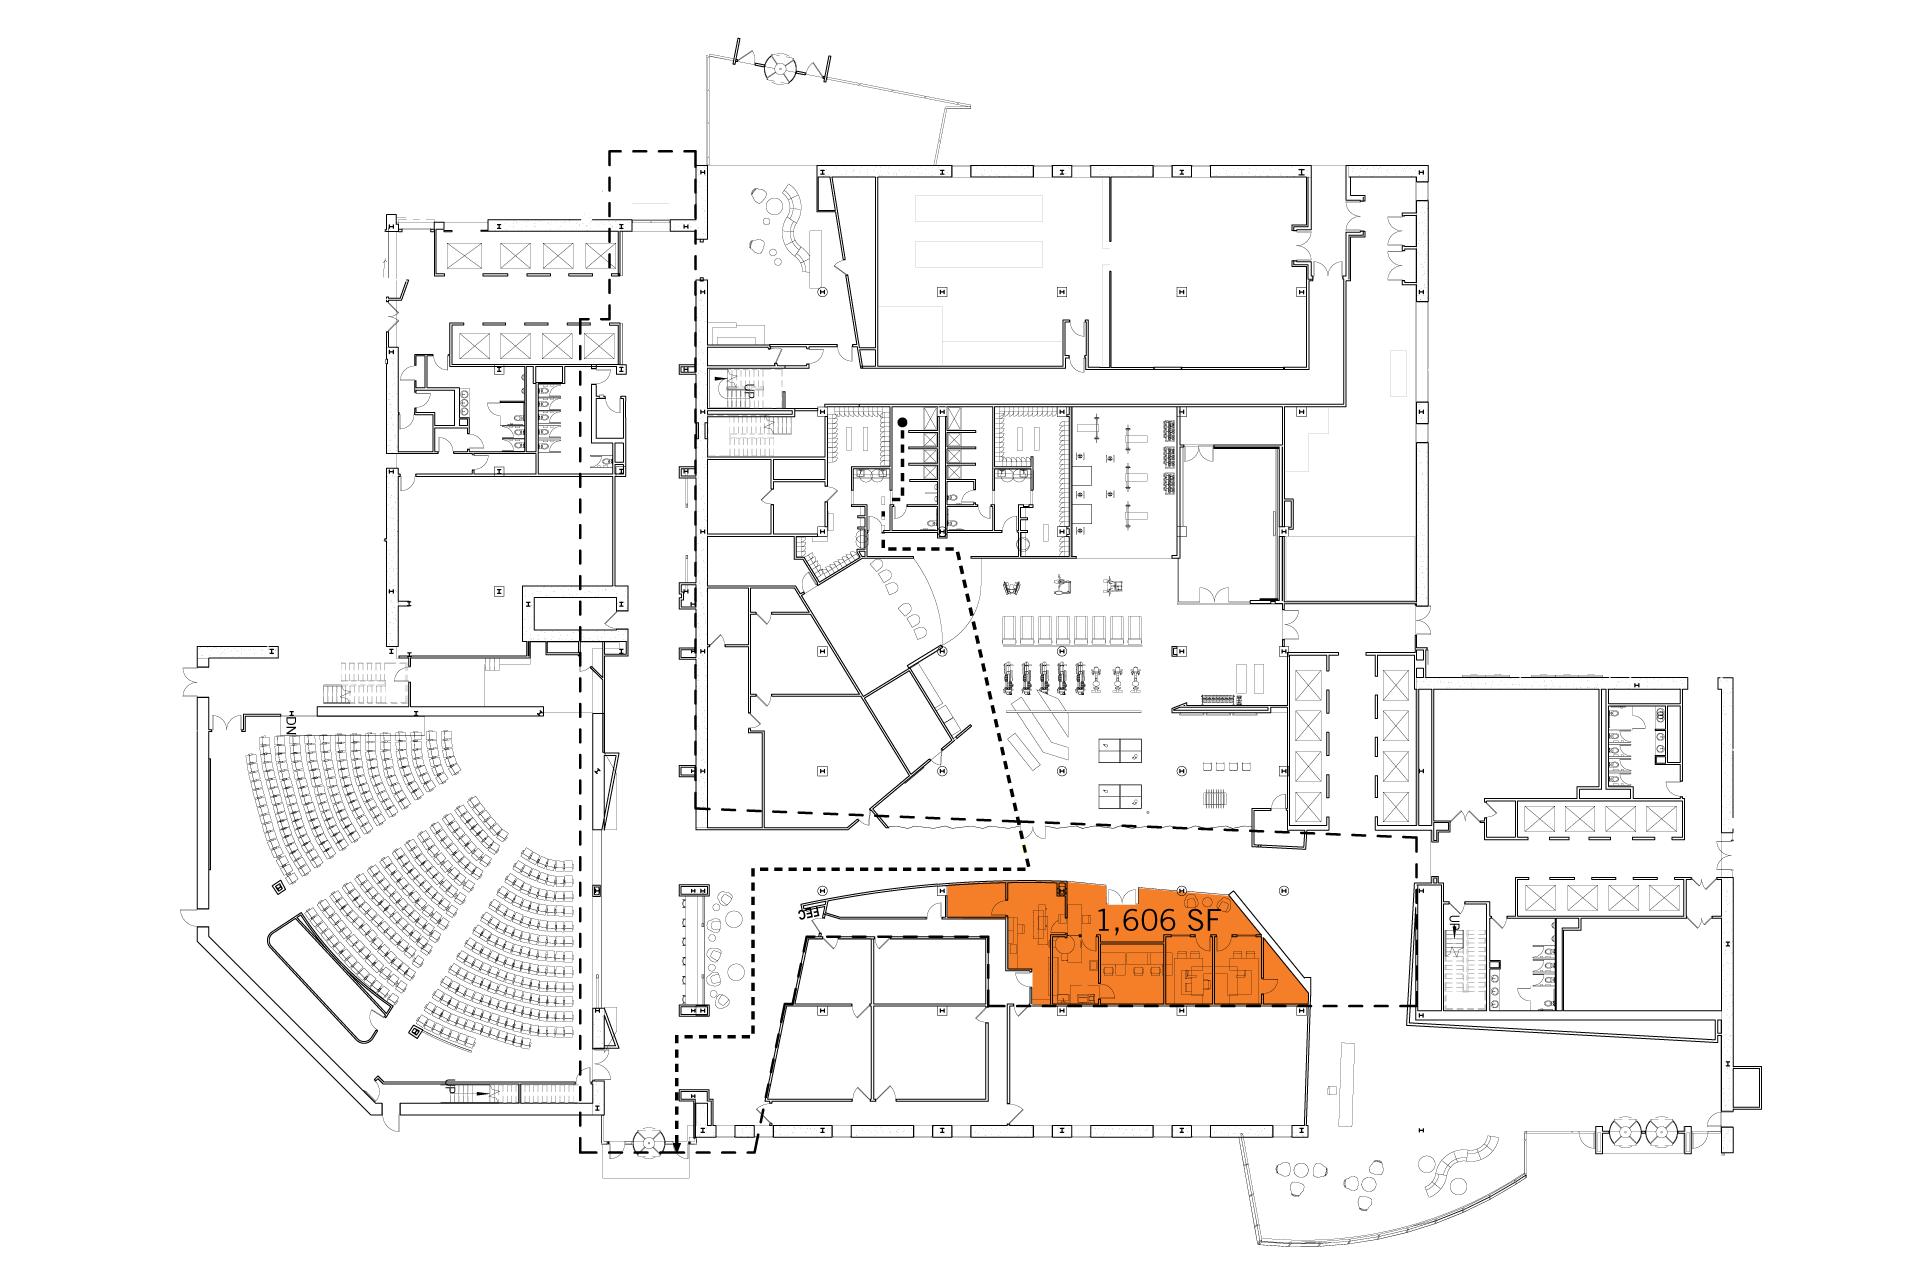 Tower 2 Floor G Floorplan Image